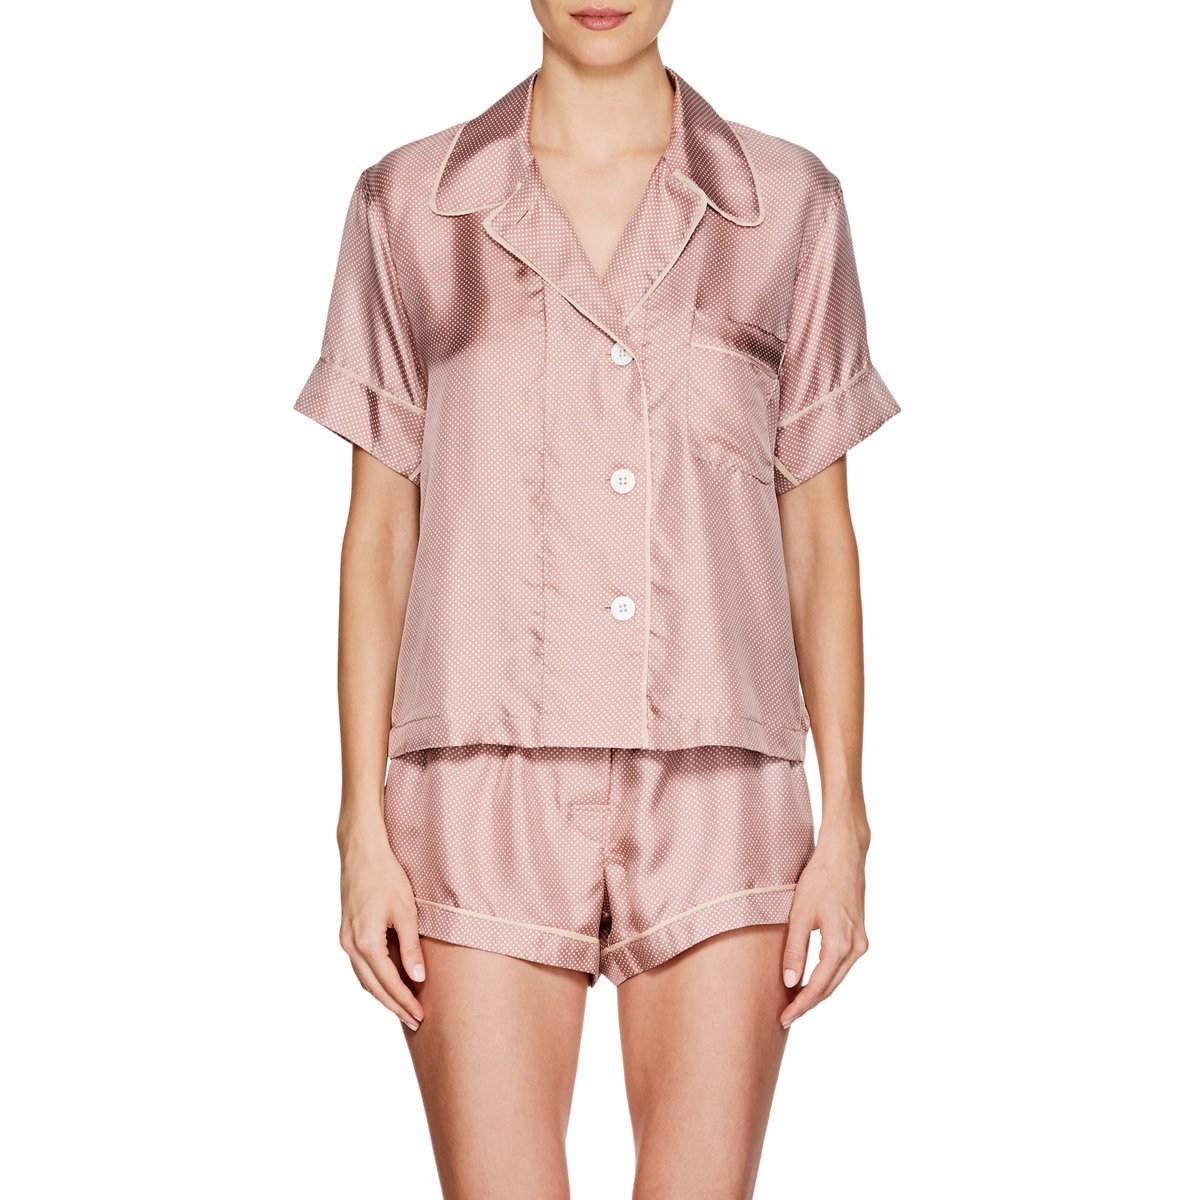 Araks Shelby Silk Pajama Top in Pink - Lyst 8fddc2052